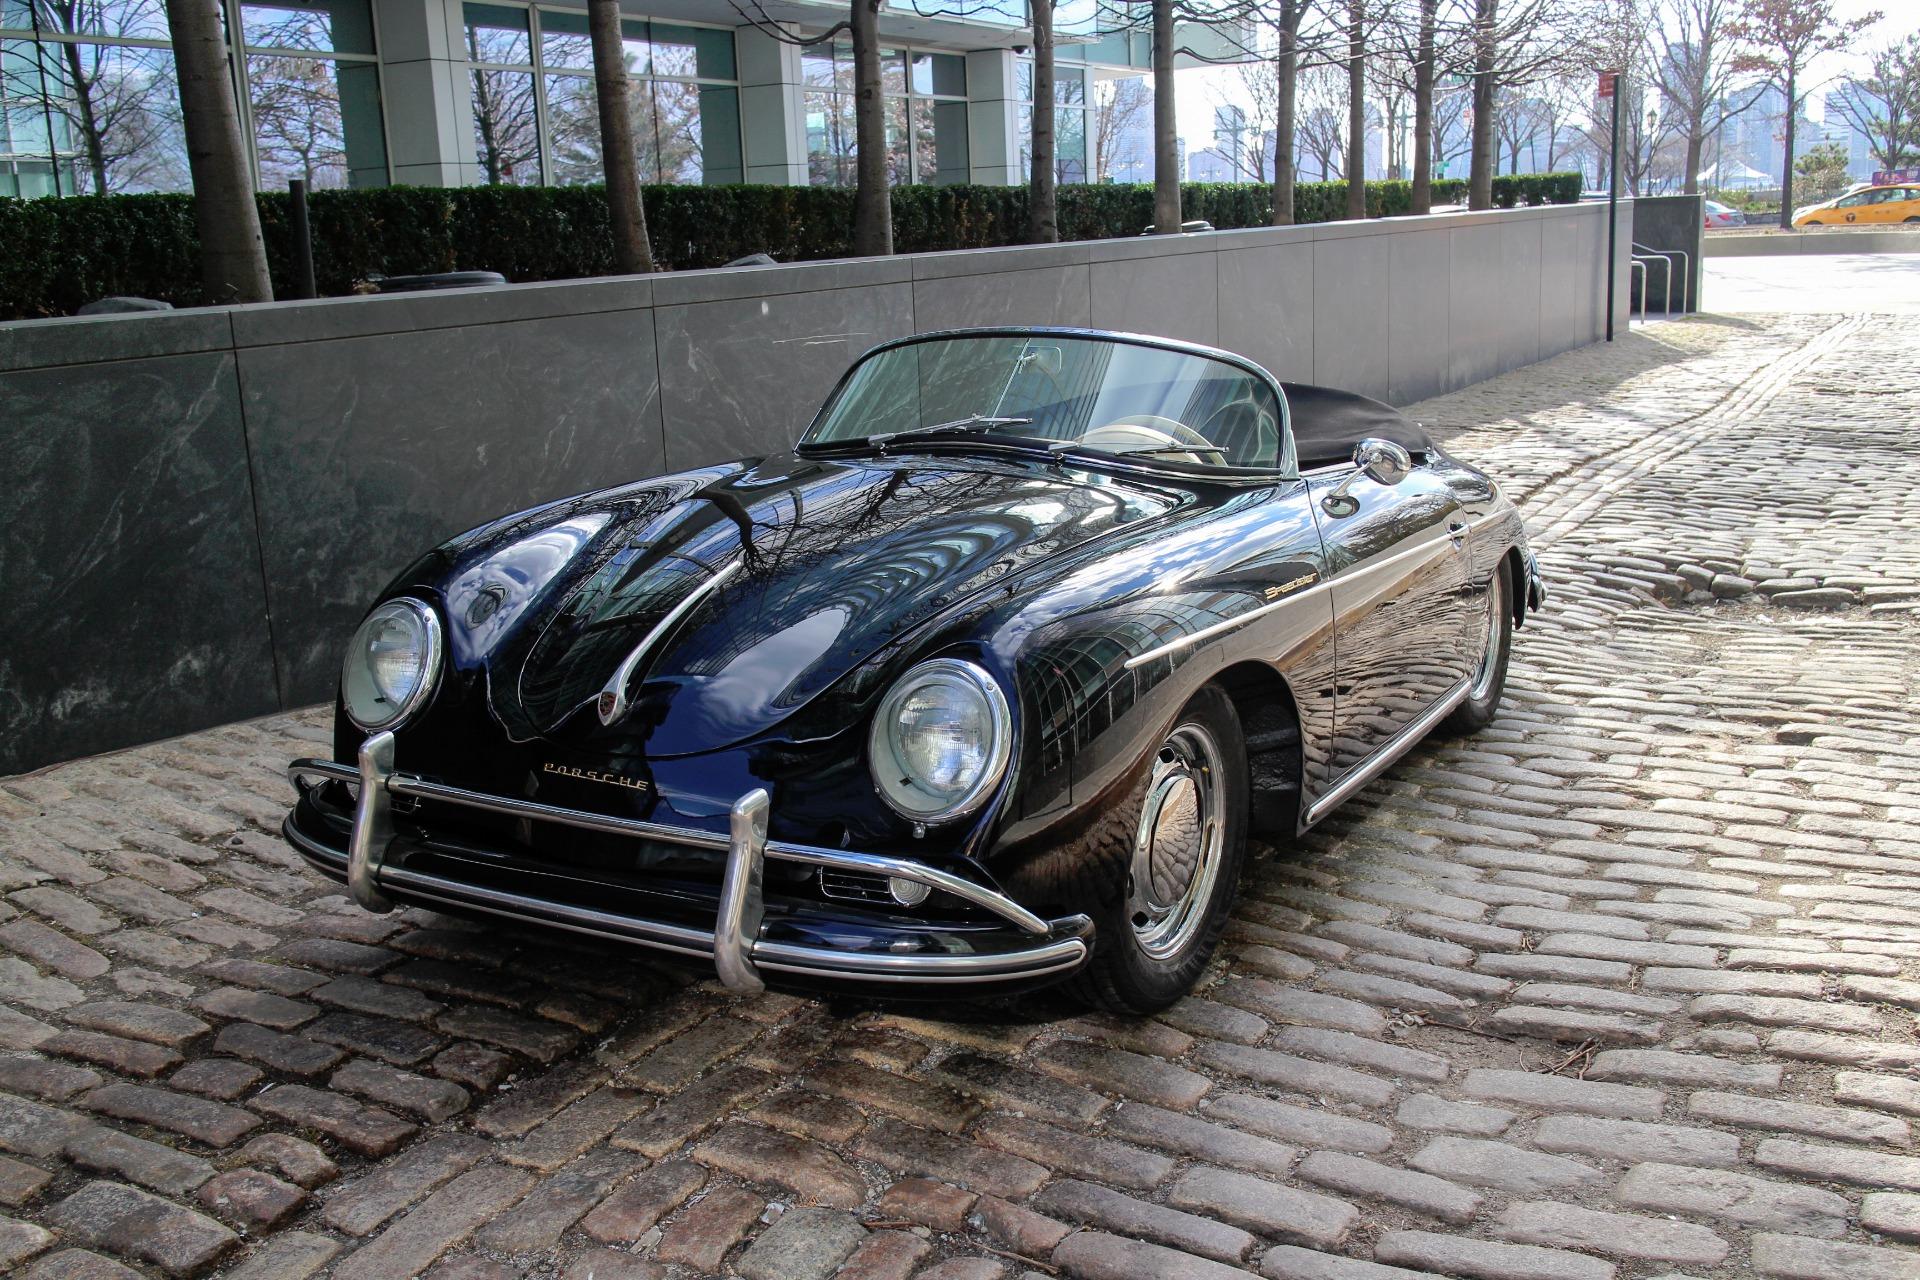 1957 Porsche 356 in Richmond, Australia for sale (10425574)  |1957 Porsche 356a